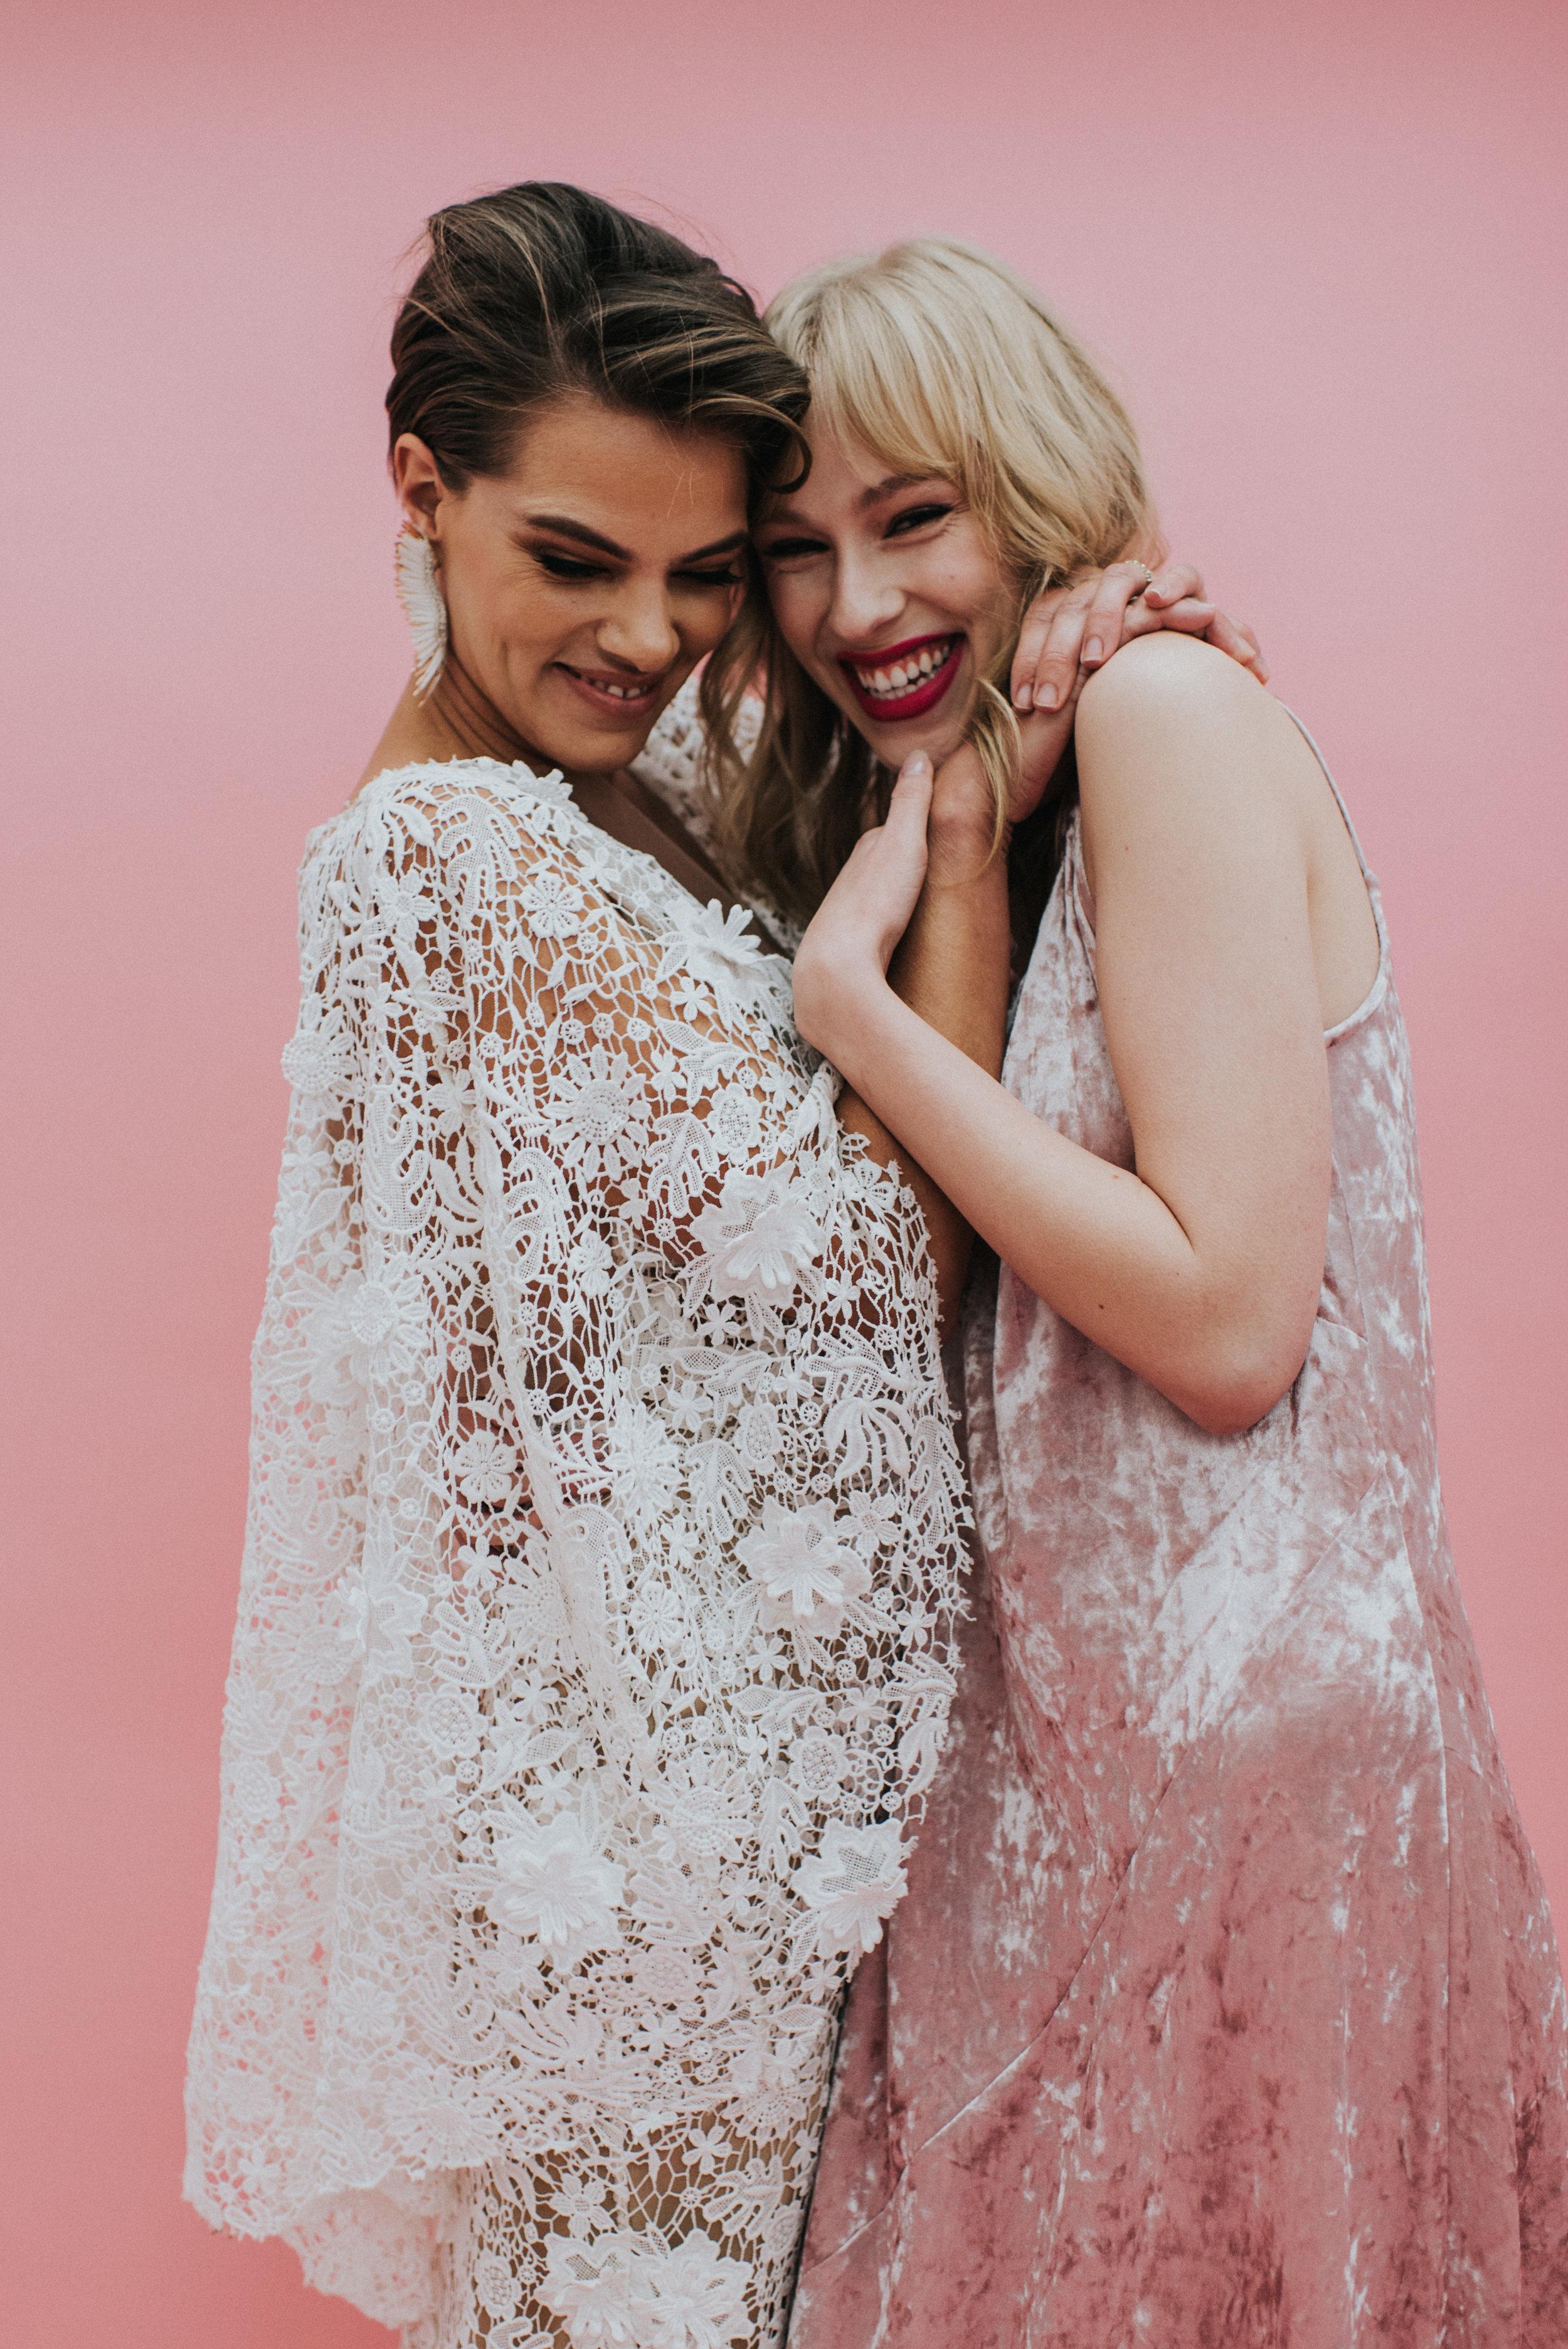 Millennial Pink Inspired Wedding - Wedding Portraits on Pink